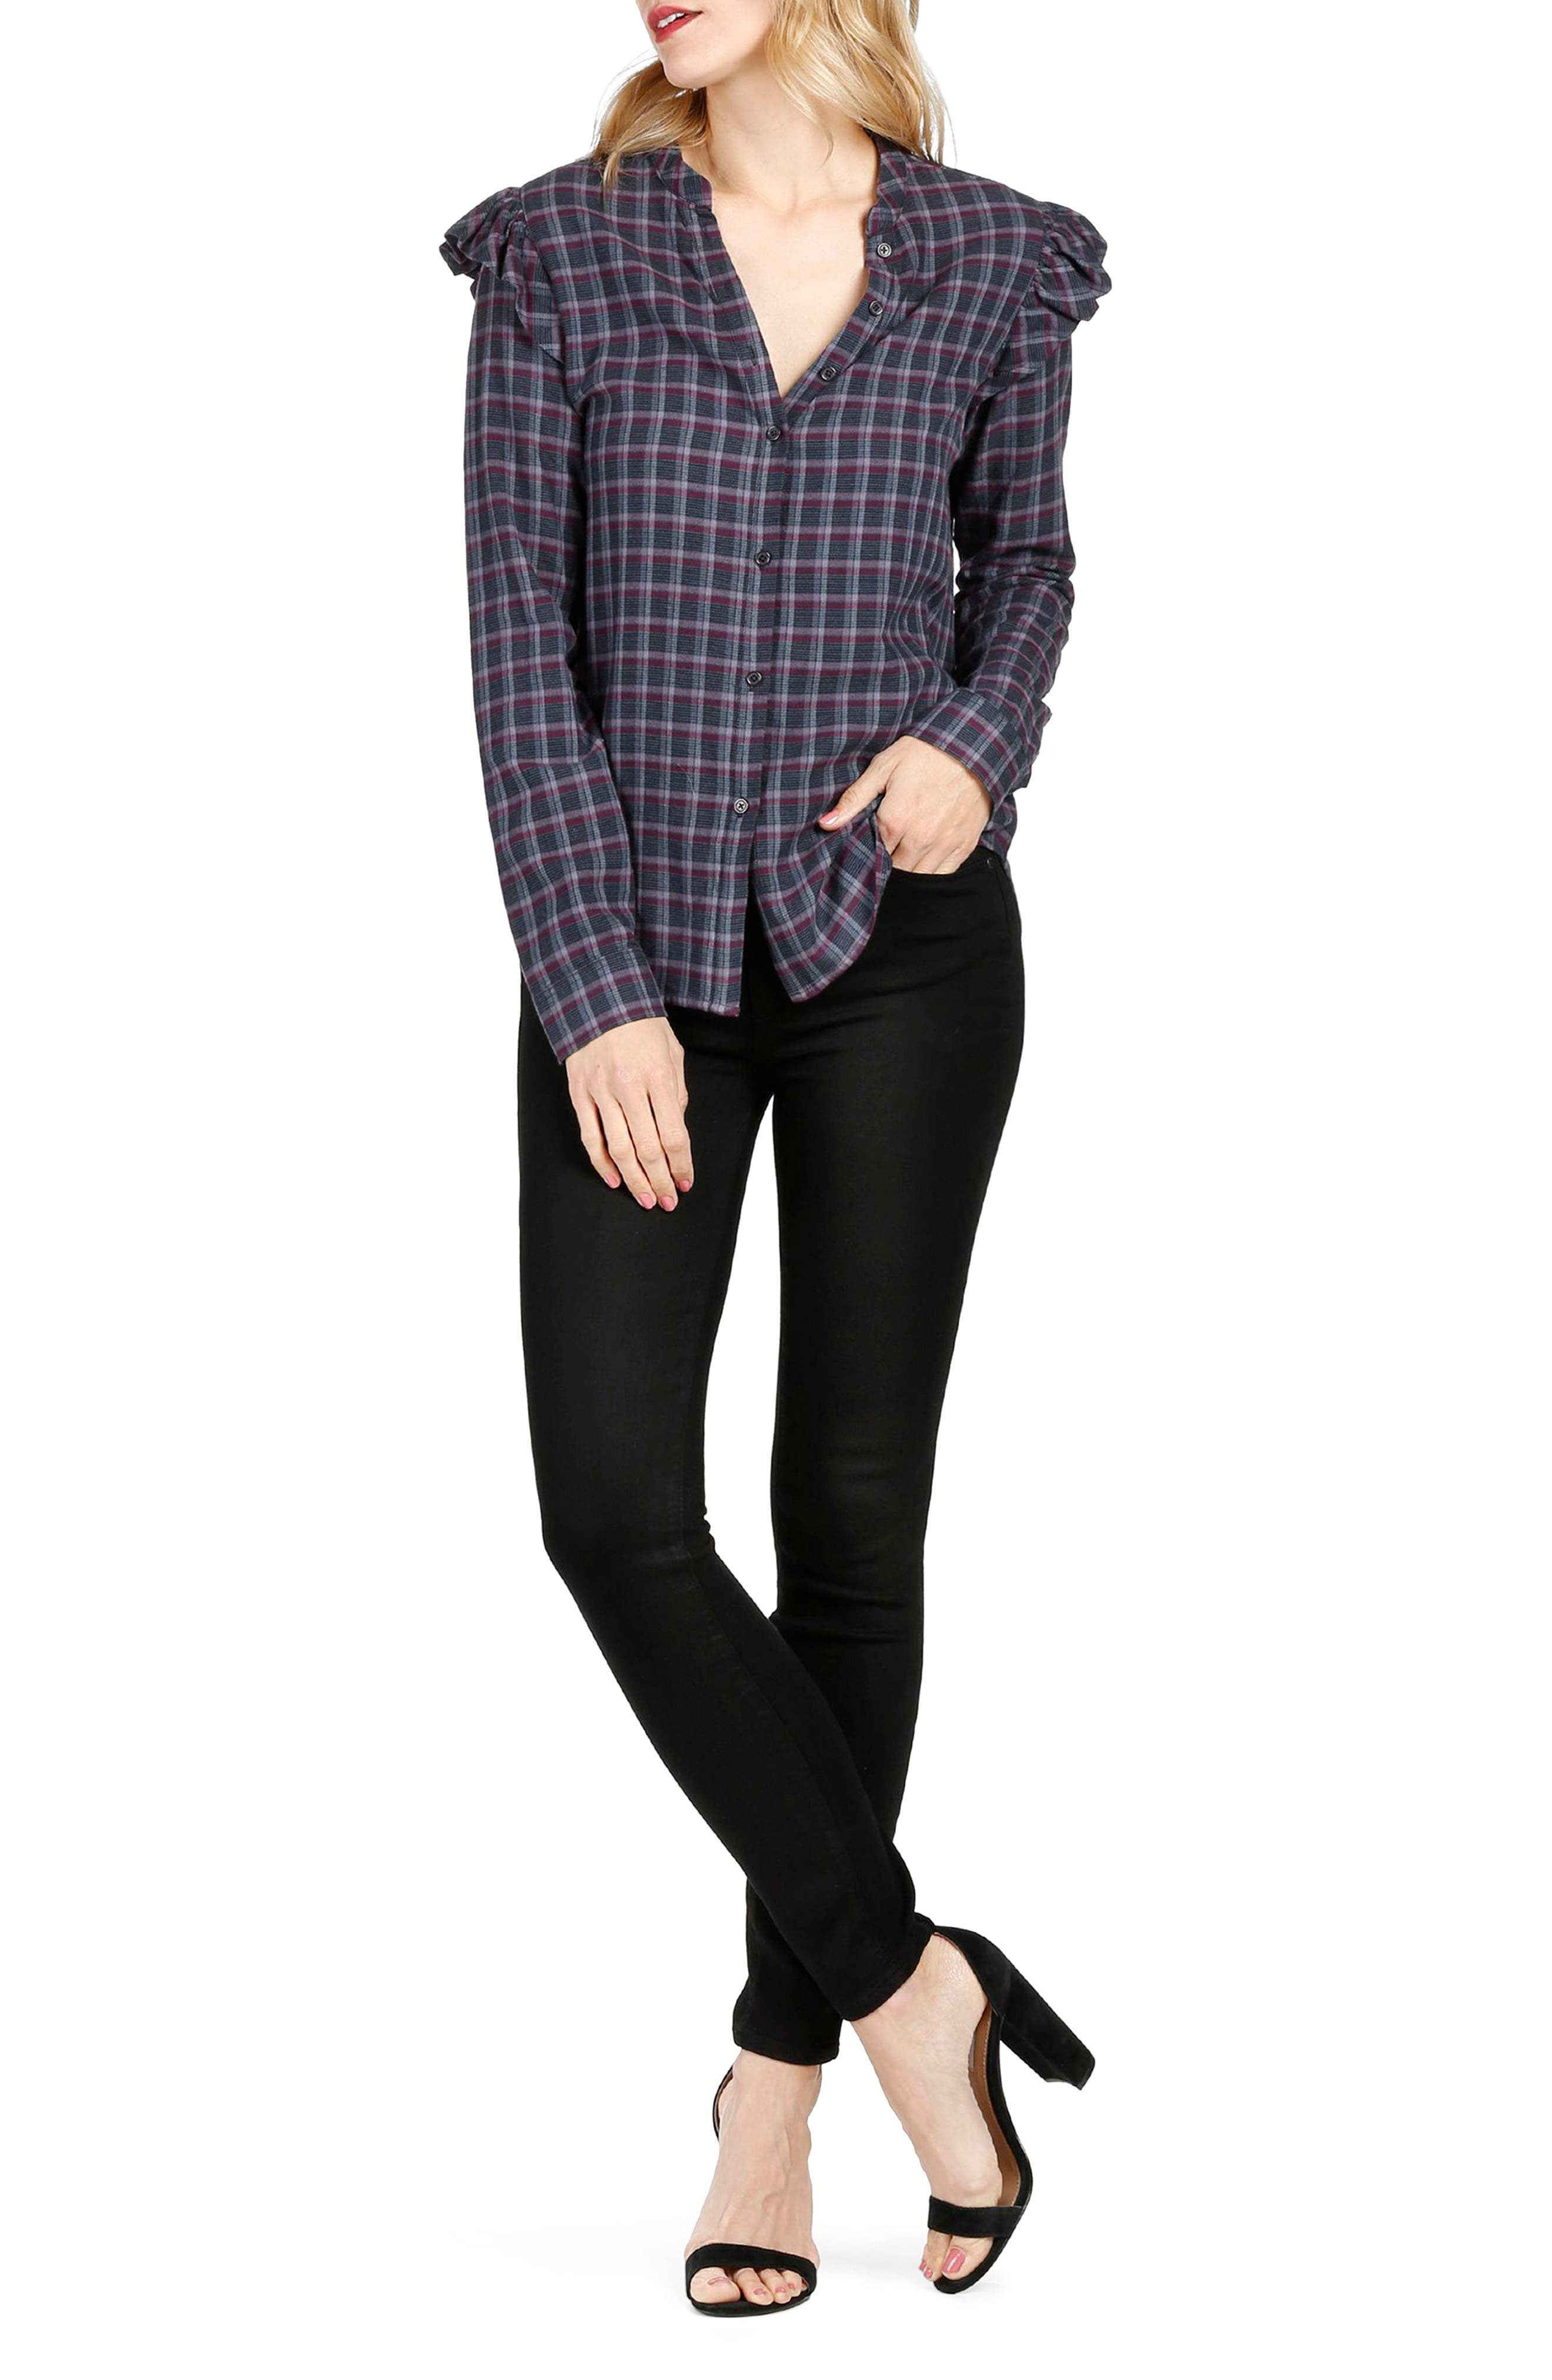 Jenelle Ruffle Plaid Shirt,                             Alternate thumbnail 2, color,                             Eclipse Multi